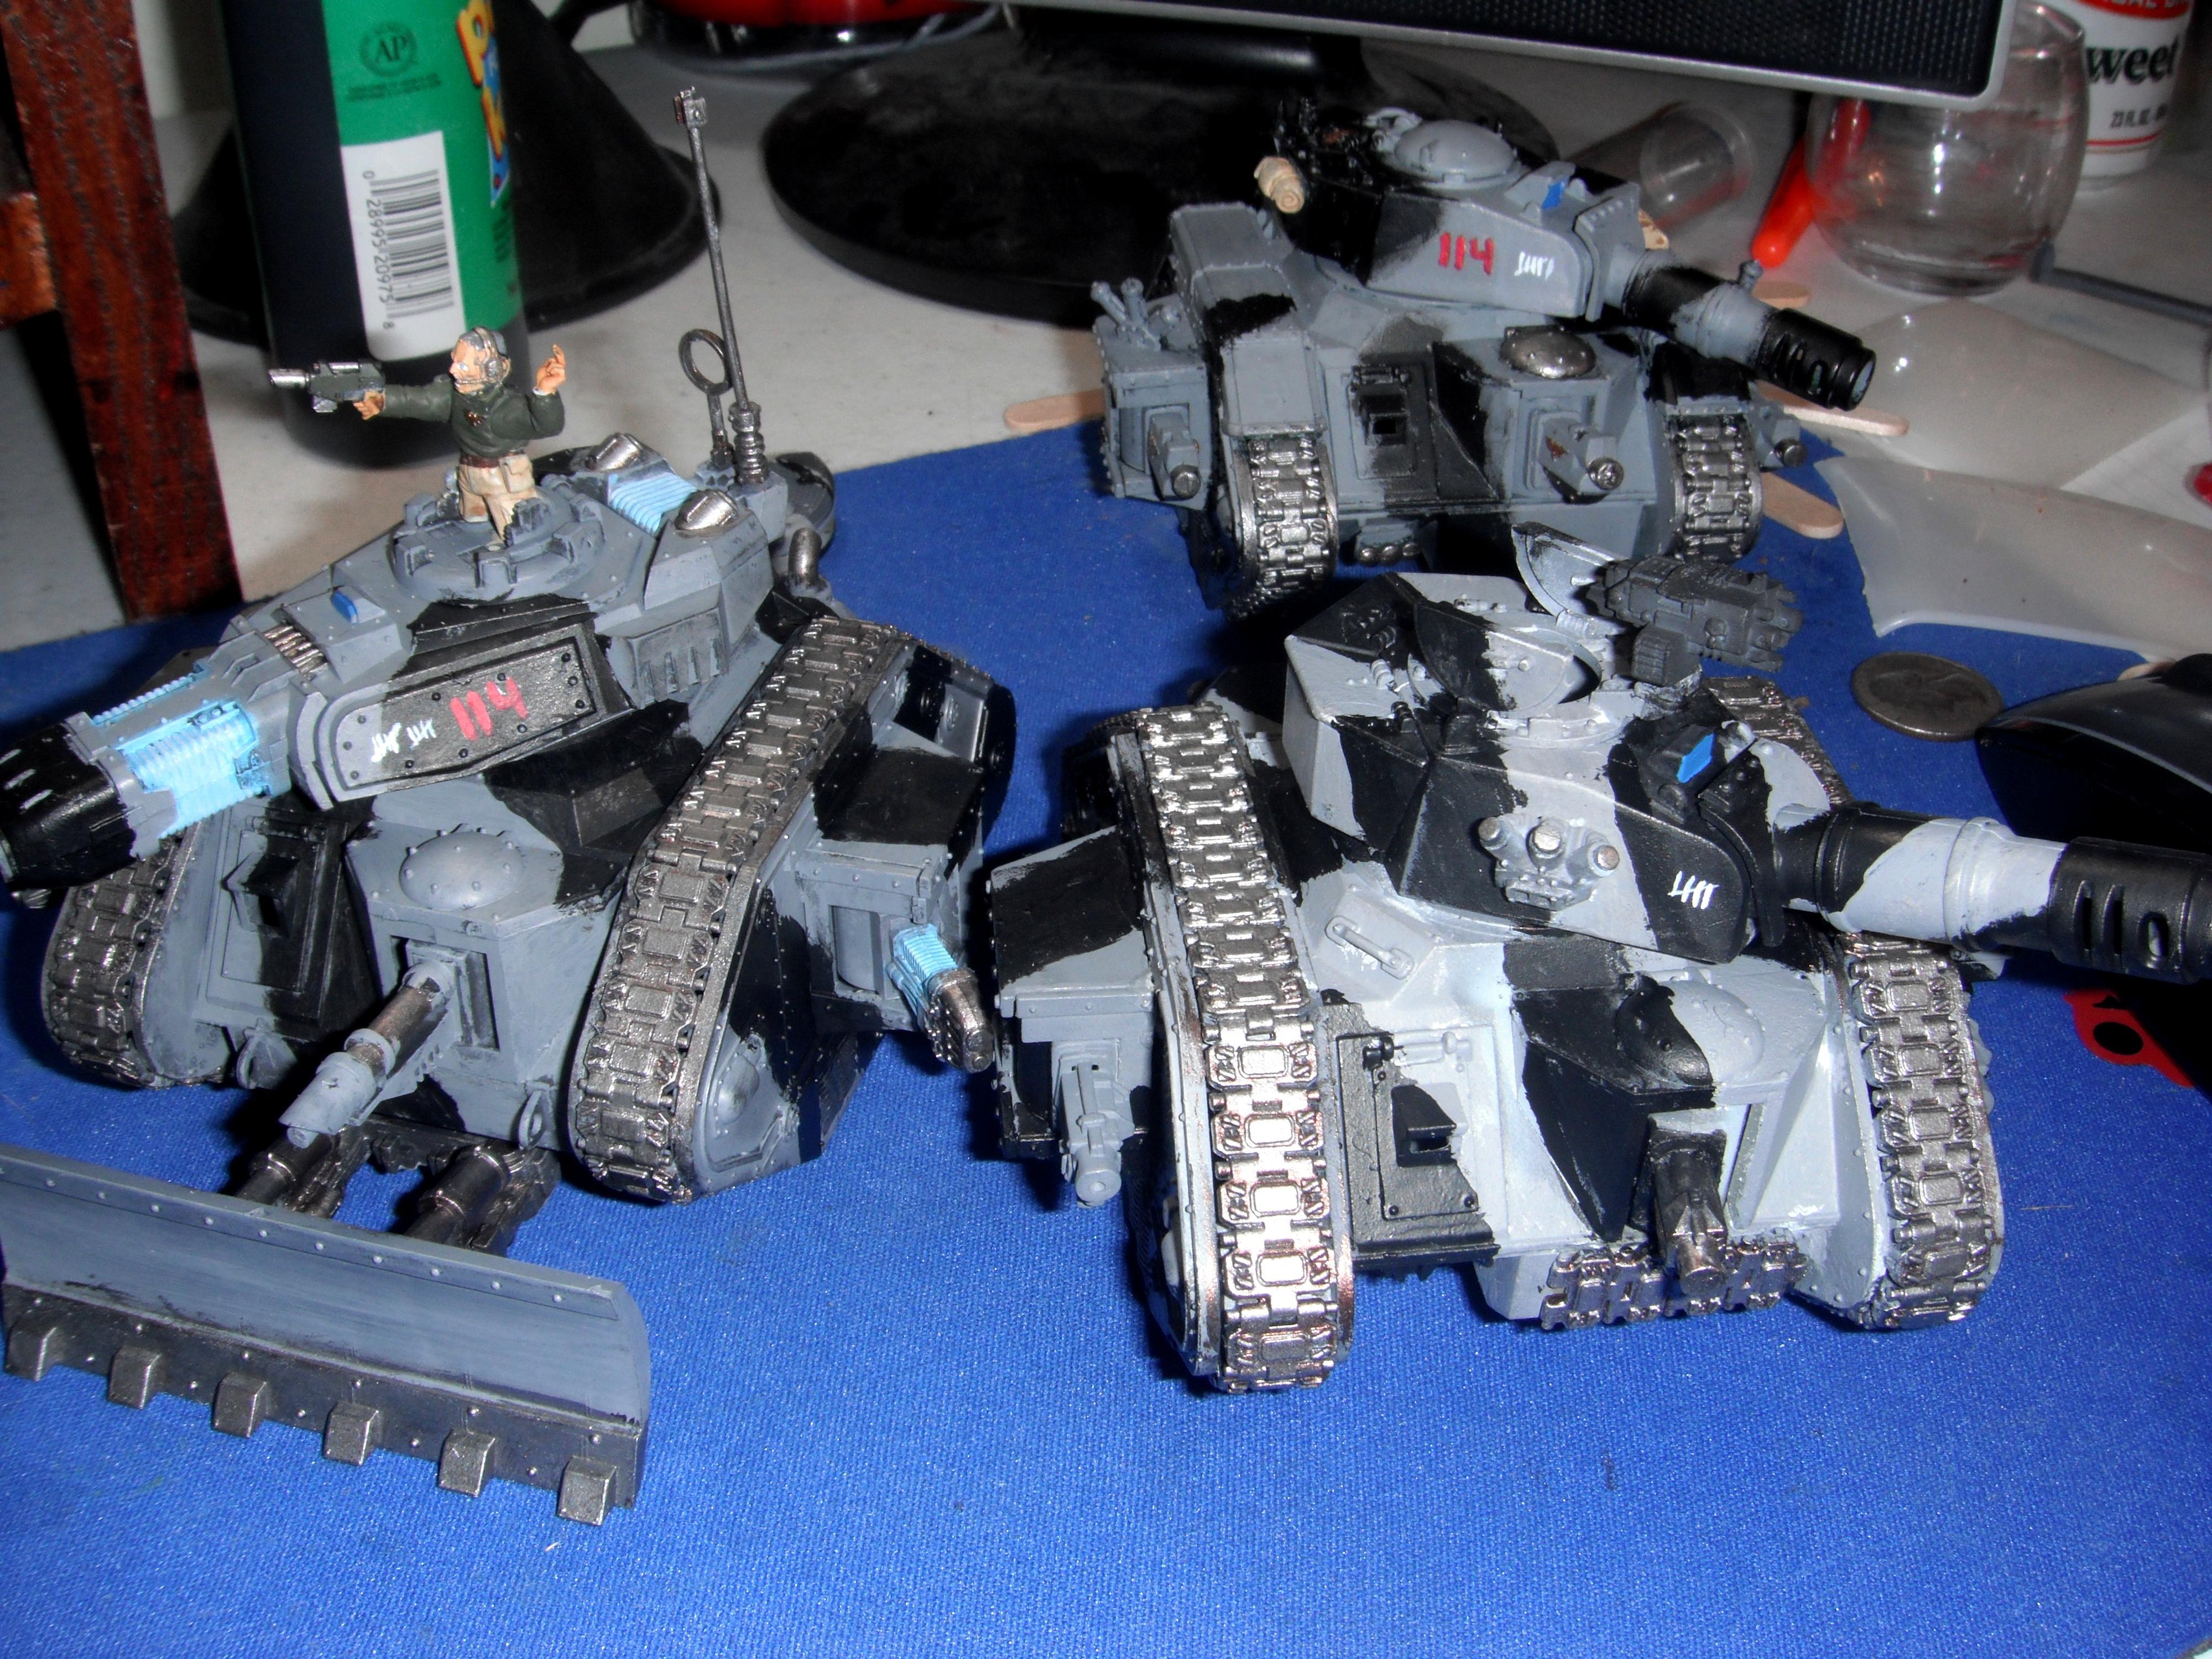 Acrtic Cammo, Battle Tank, Executioner, Leman Russ